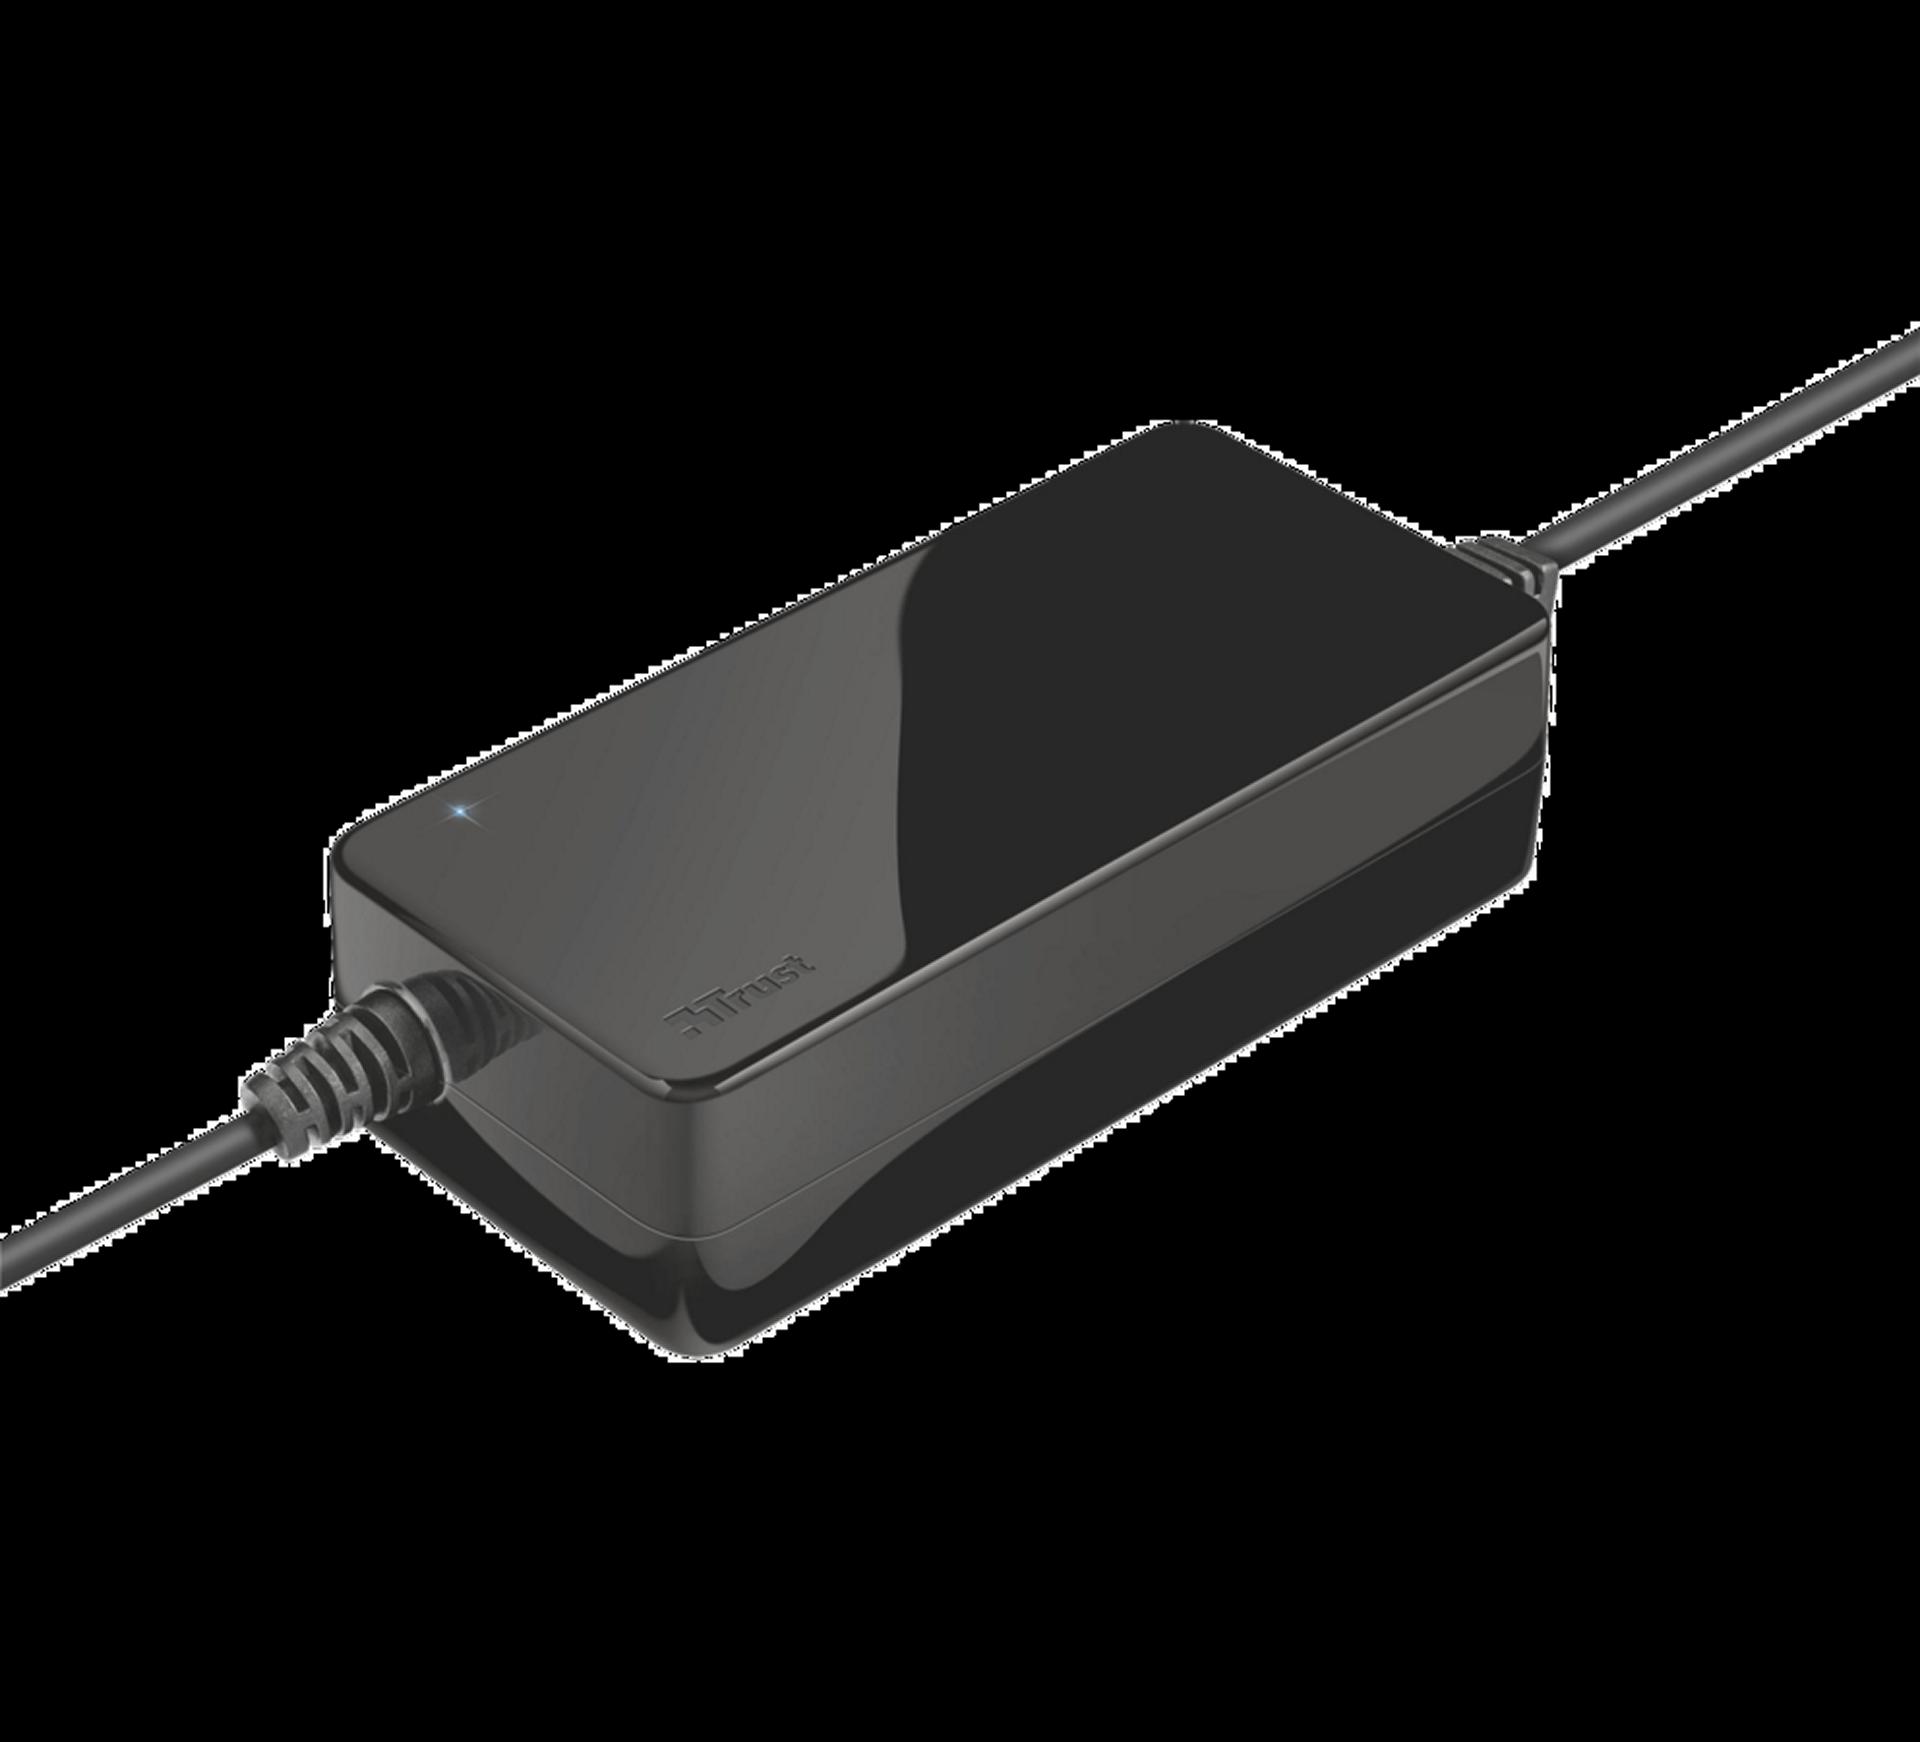 sada TRUST 70W Primo Laptop Charger - black